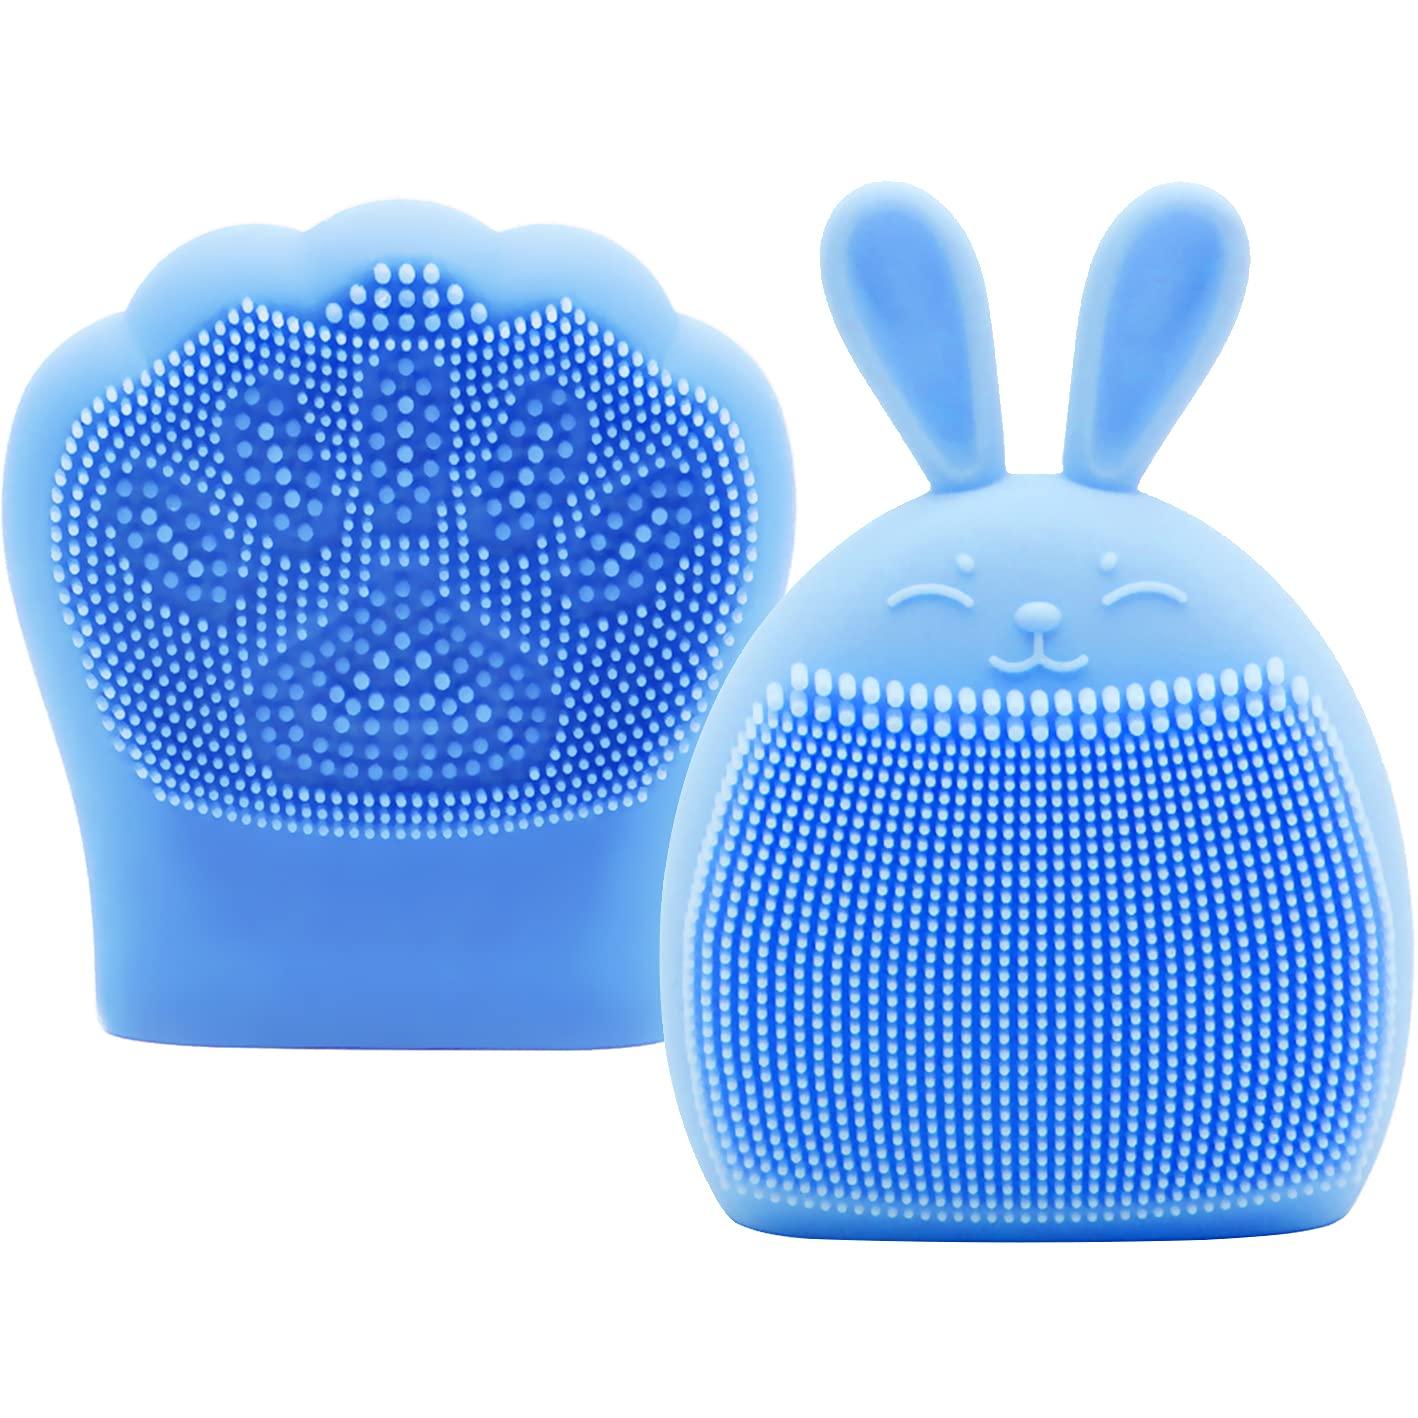 Baby Bath Brush Silicone shipfree Massage Cap Cradle Ranking TOP13